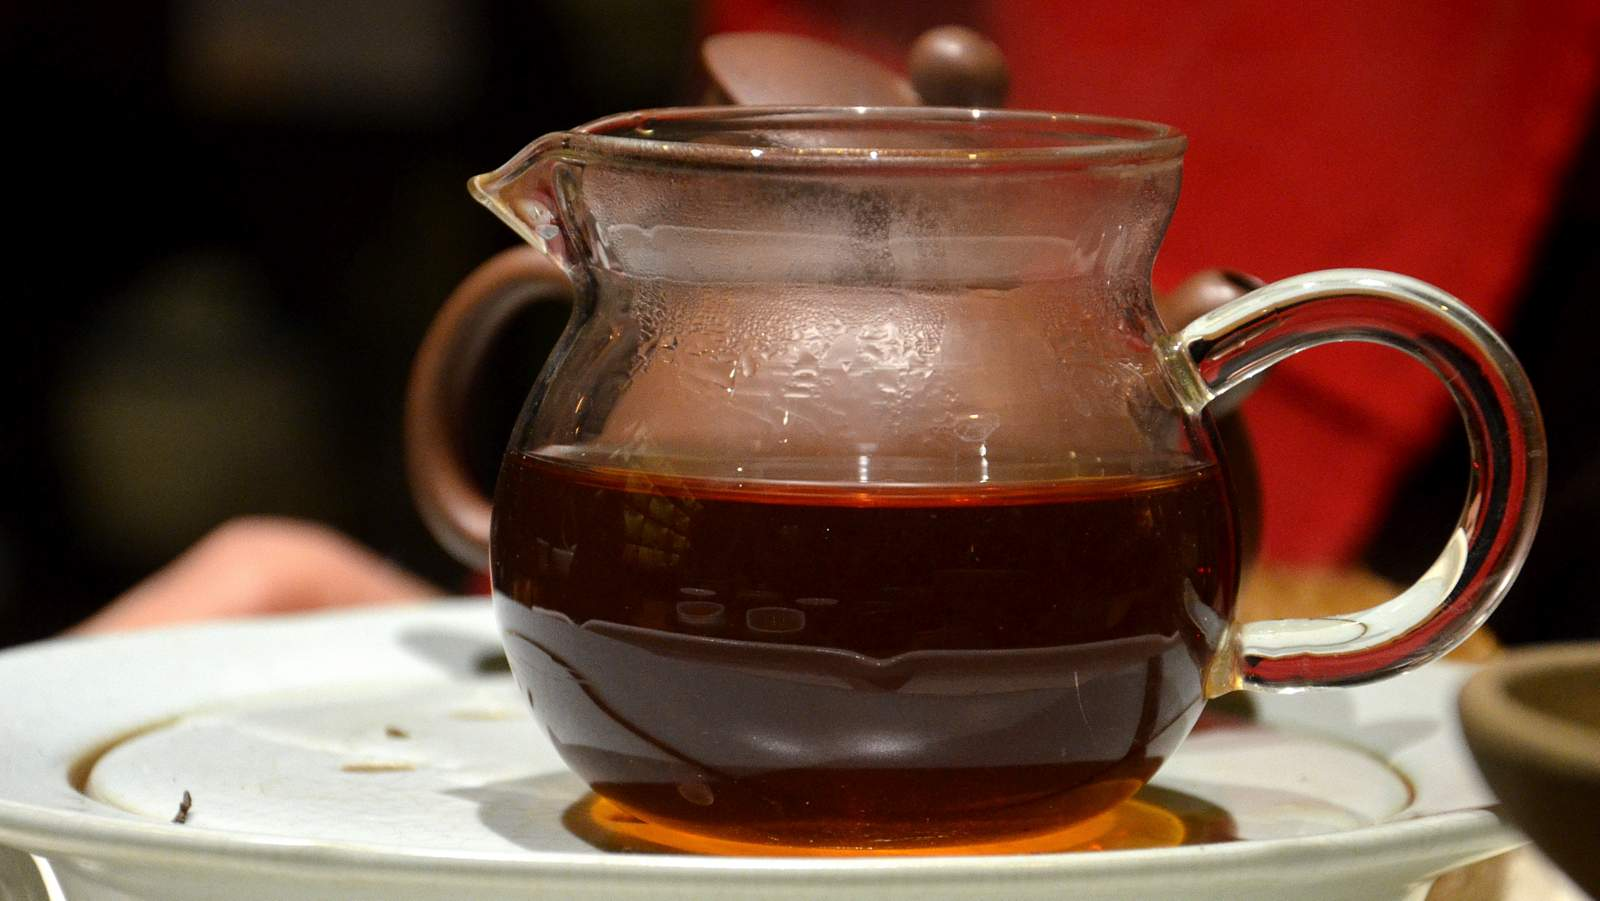 CNNP raw Pu-erh blend 7542, red label from 1996 of Menghai tea factory, mature orange